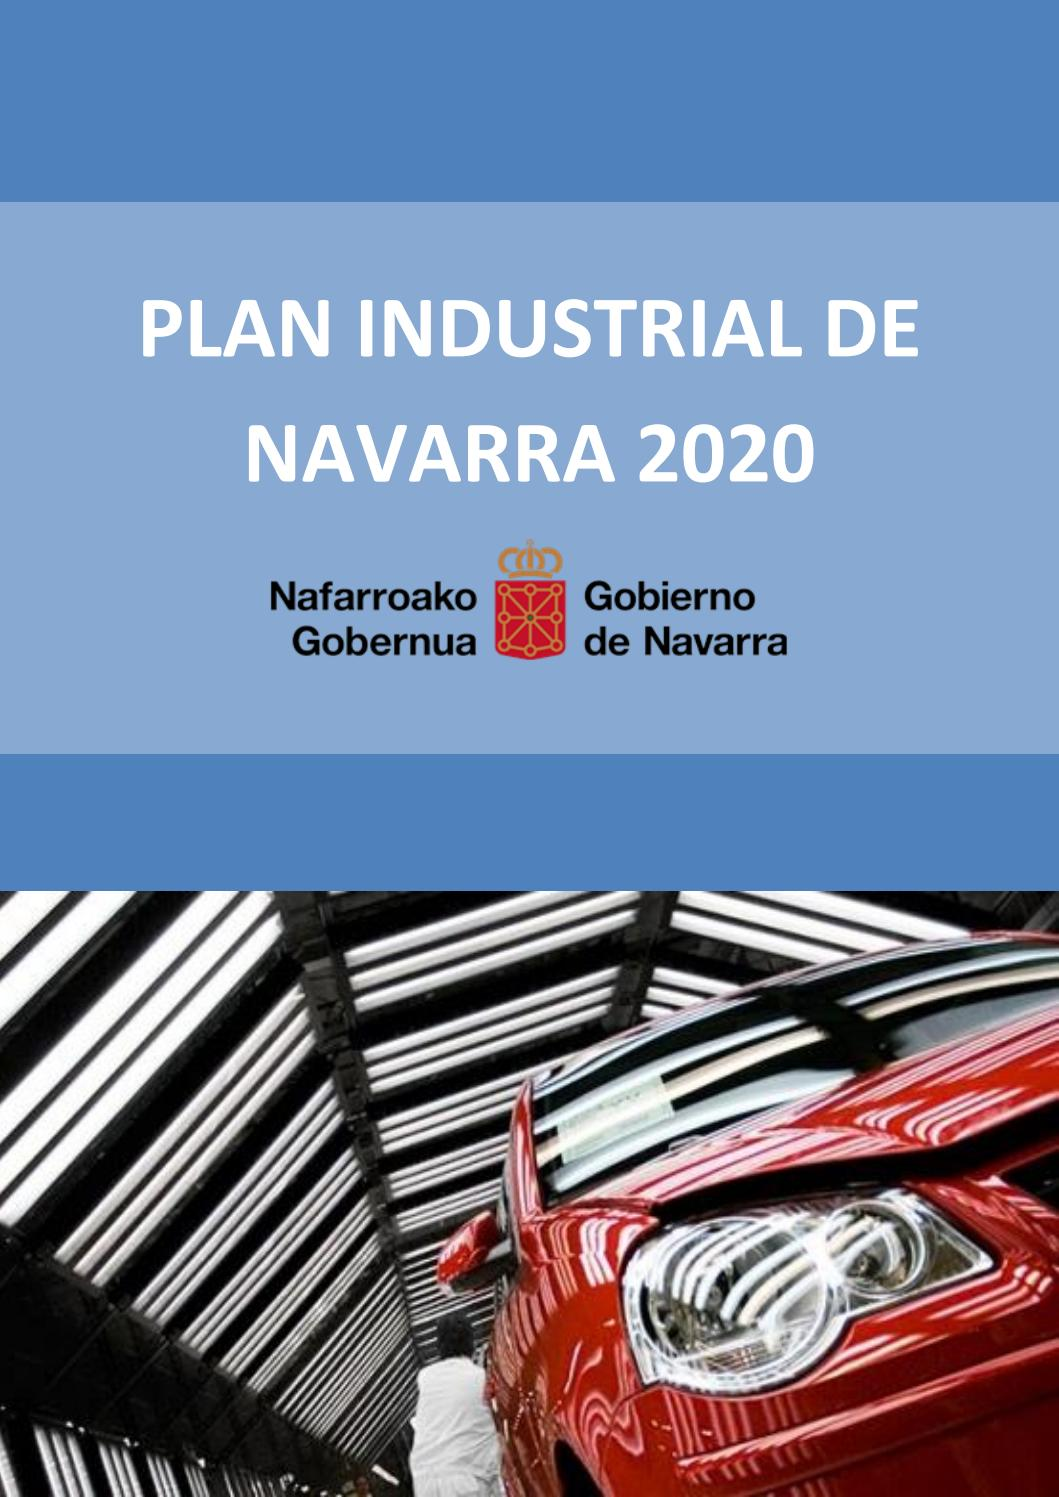 Plan Industrial de Navarra 2020 by Navarra Capital - issuu